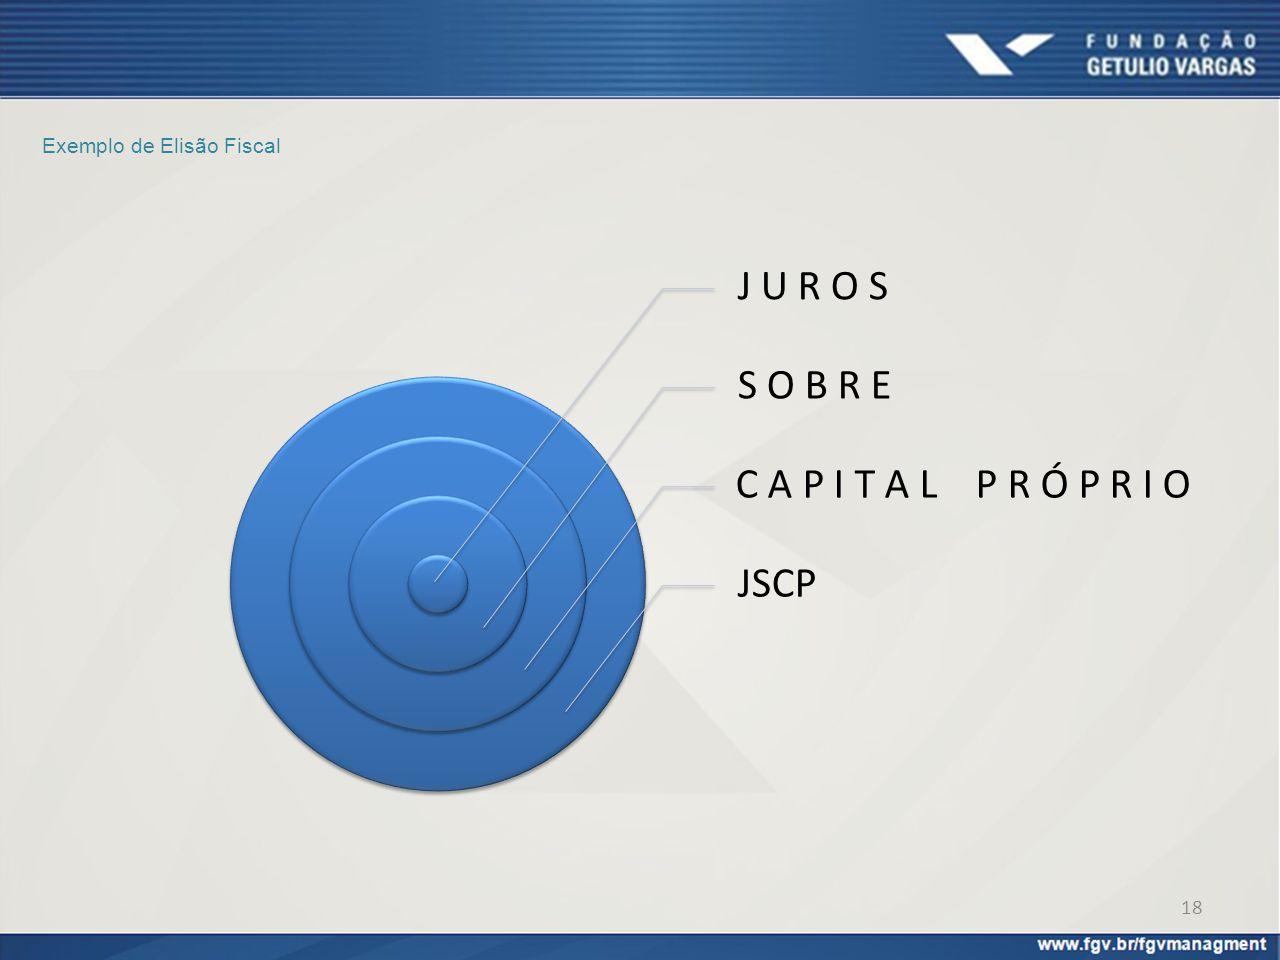 Exemplo de Elisão Fiscal J U R O S S O B R E C A P I T A L P R Ó P R I O JSCP 18